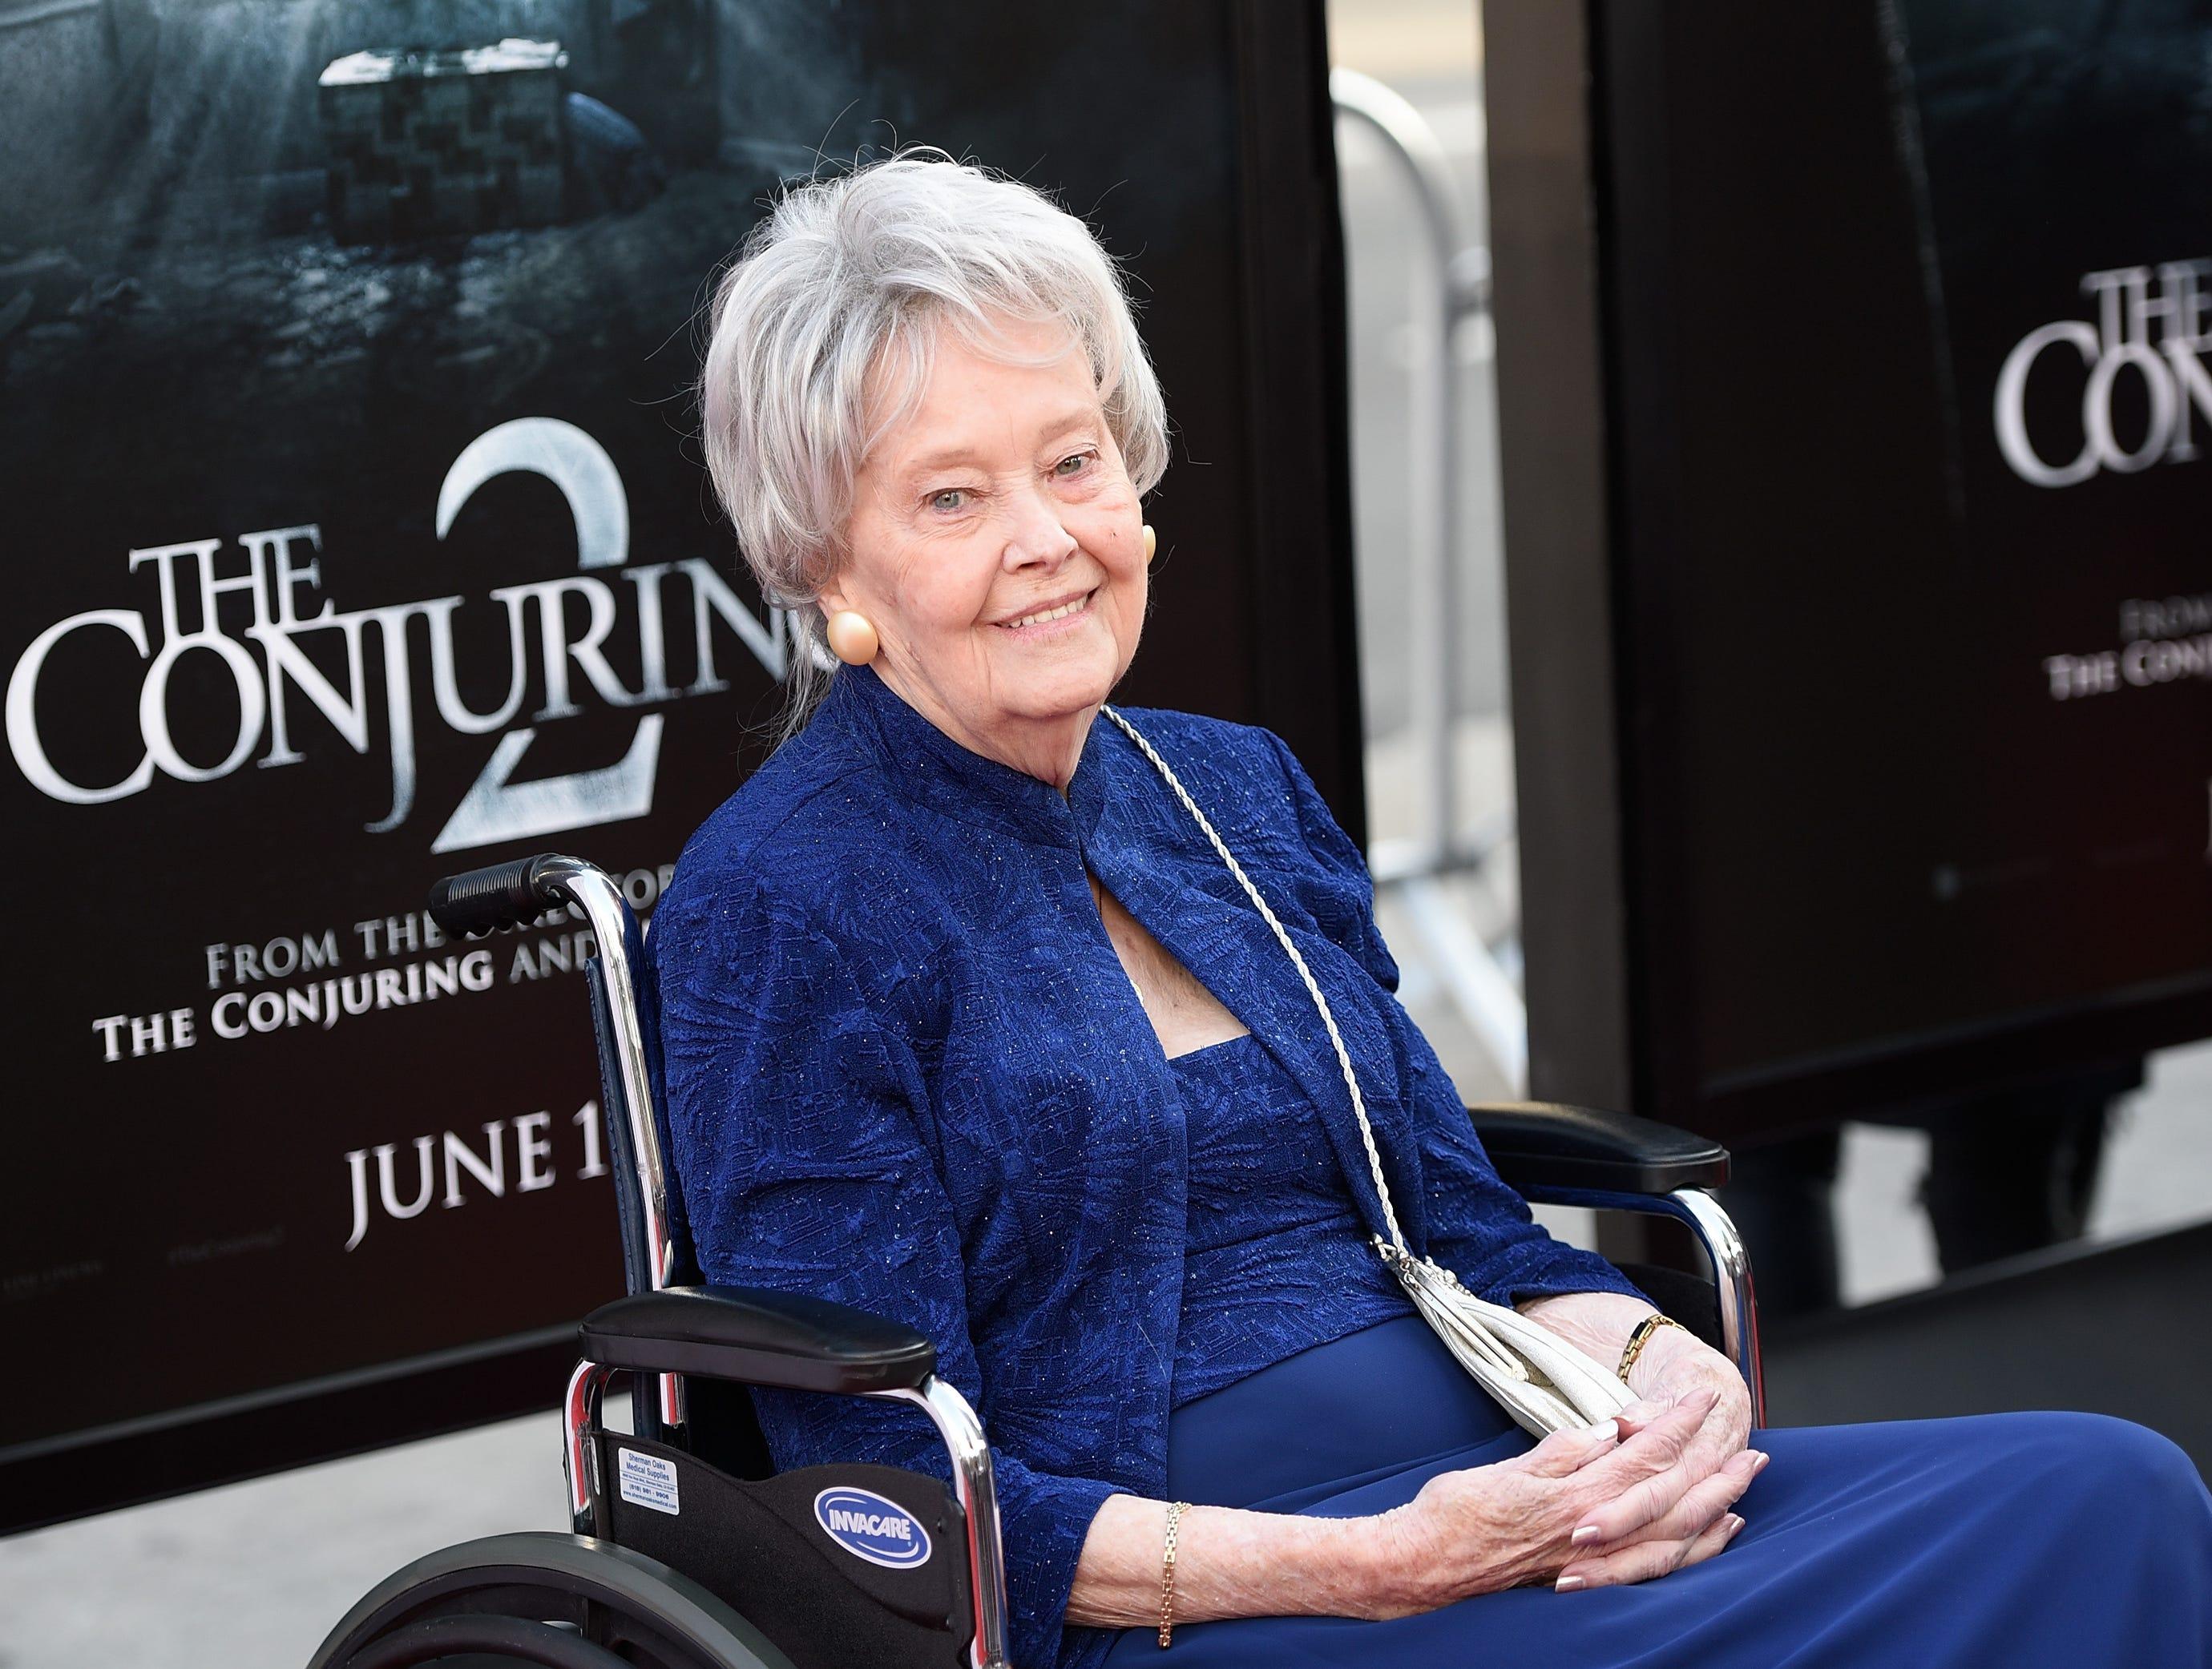 Vera Farmiga mourns death of Lorraine Warren, 92, who inspired her 'Conjuring' character